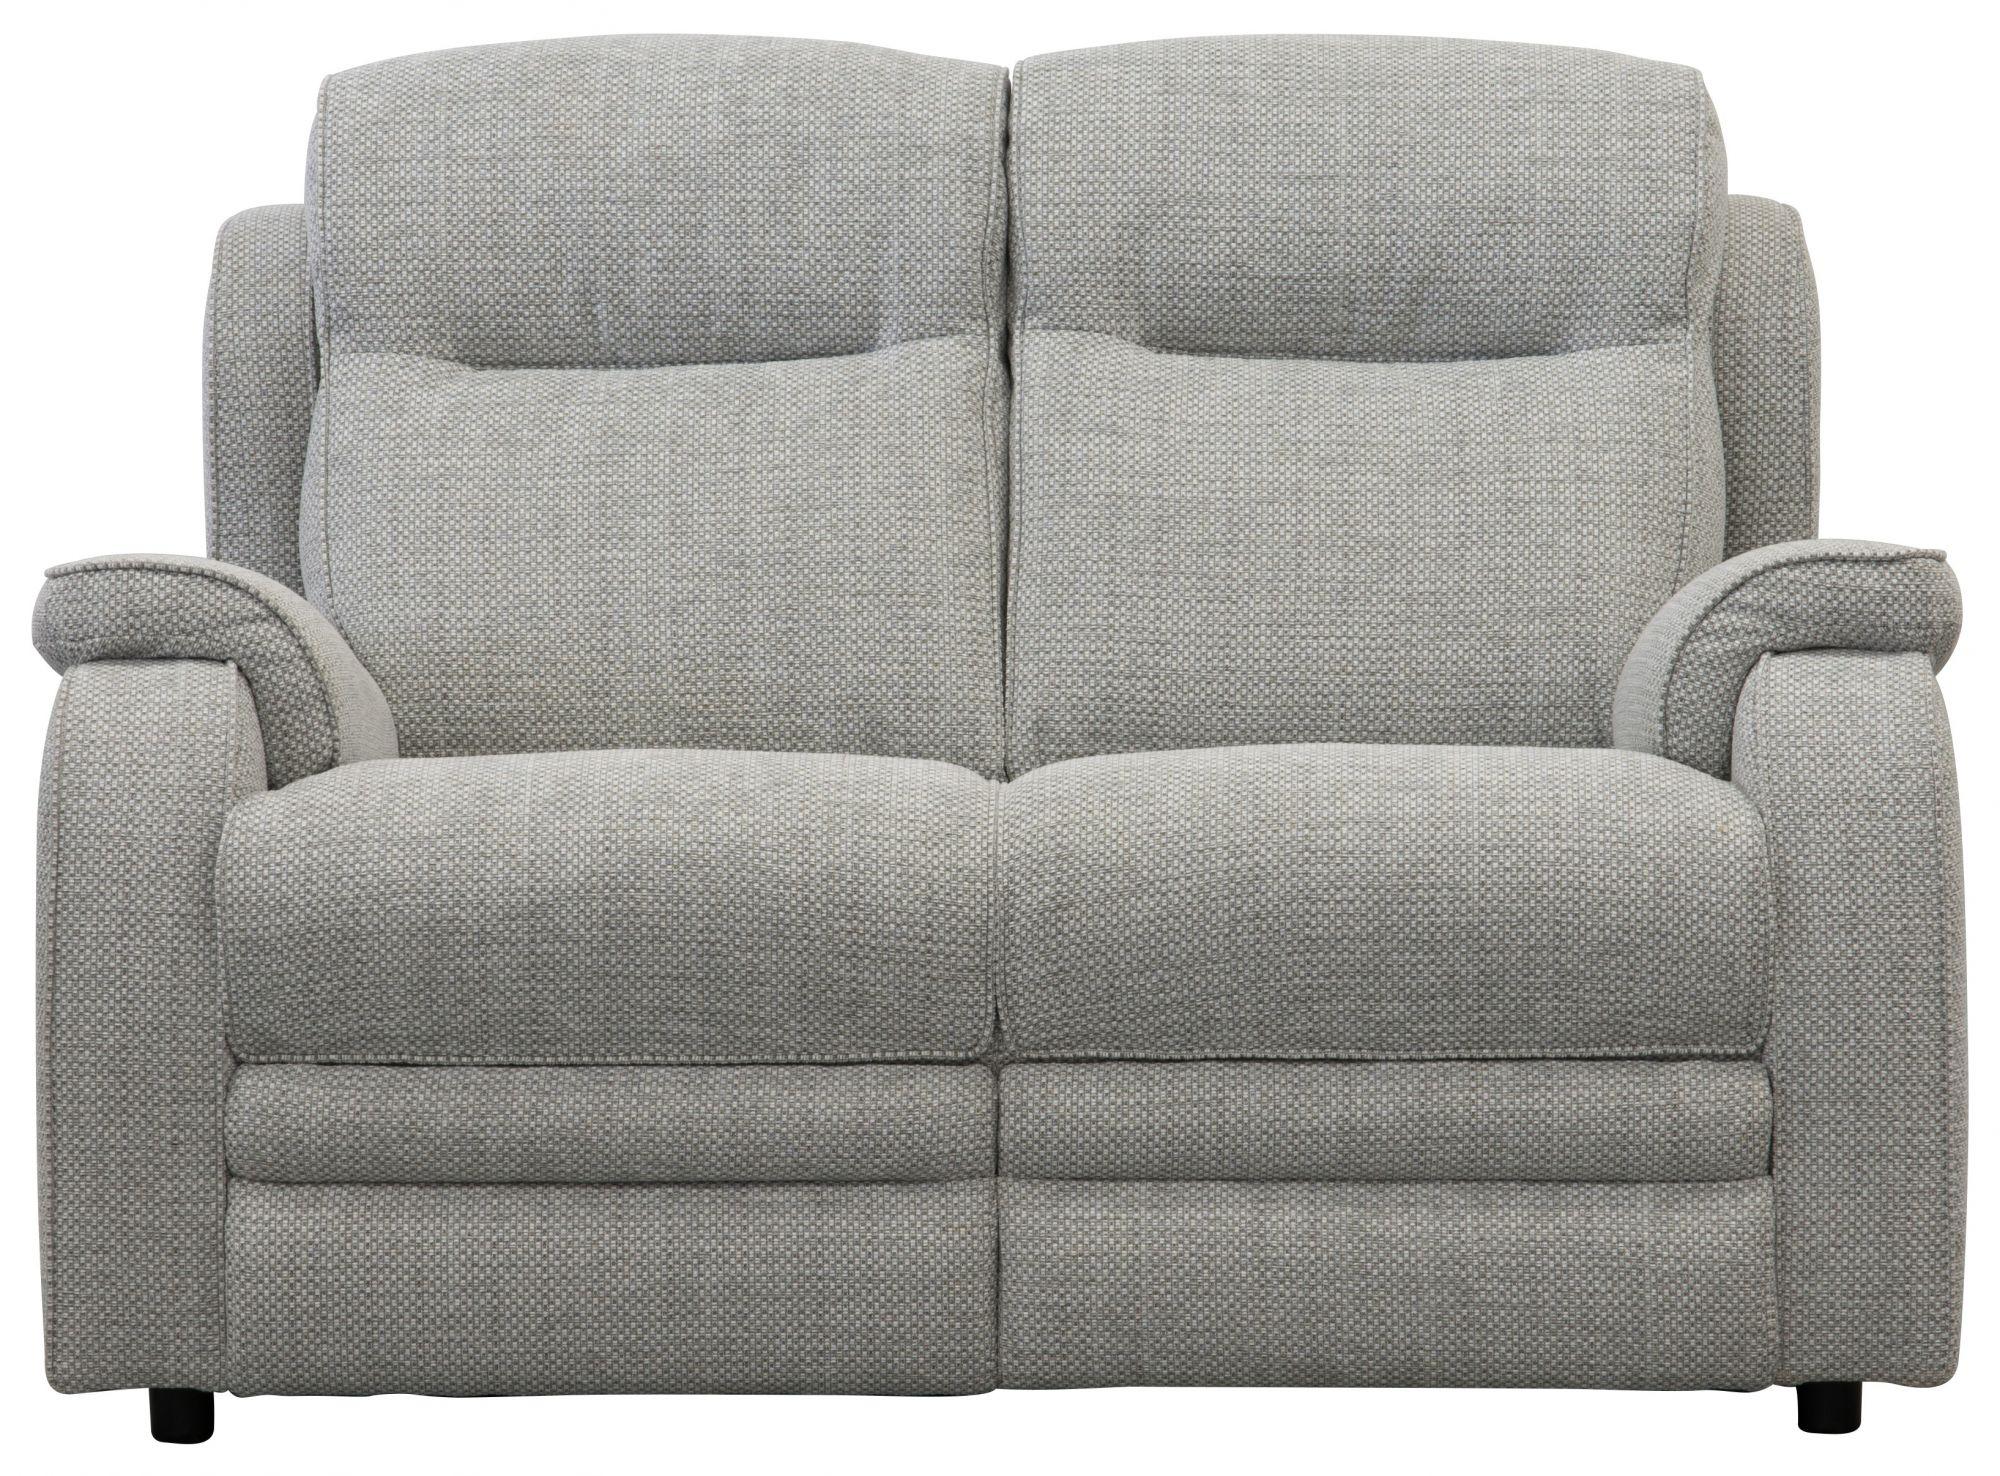 Parker Knoll Boston 2 Seater Sofa Small Sofas Living Homes